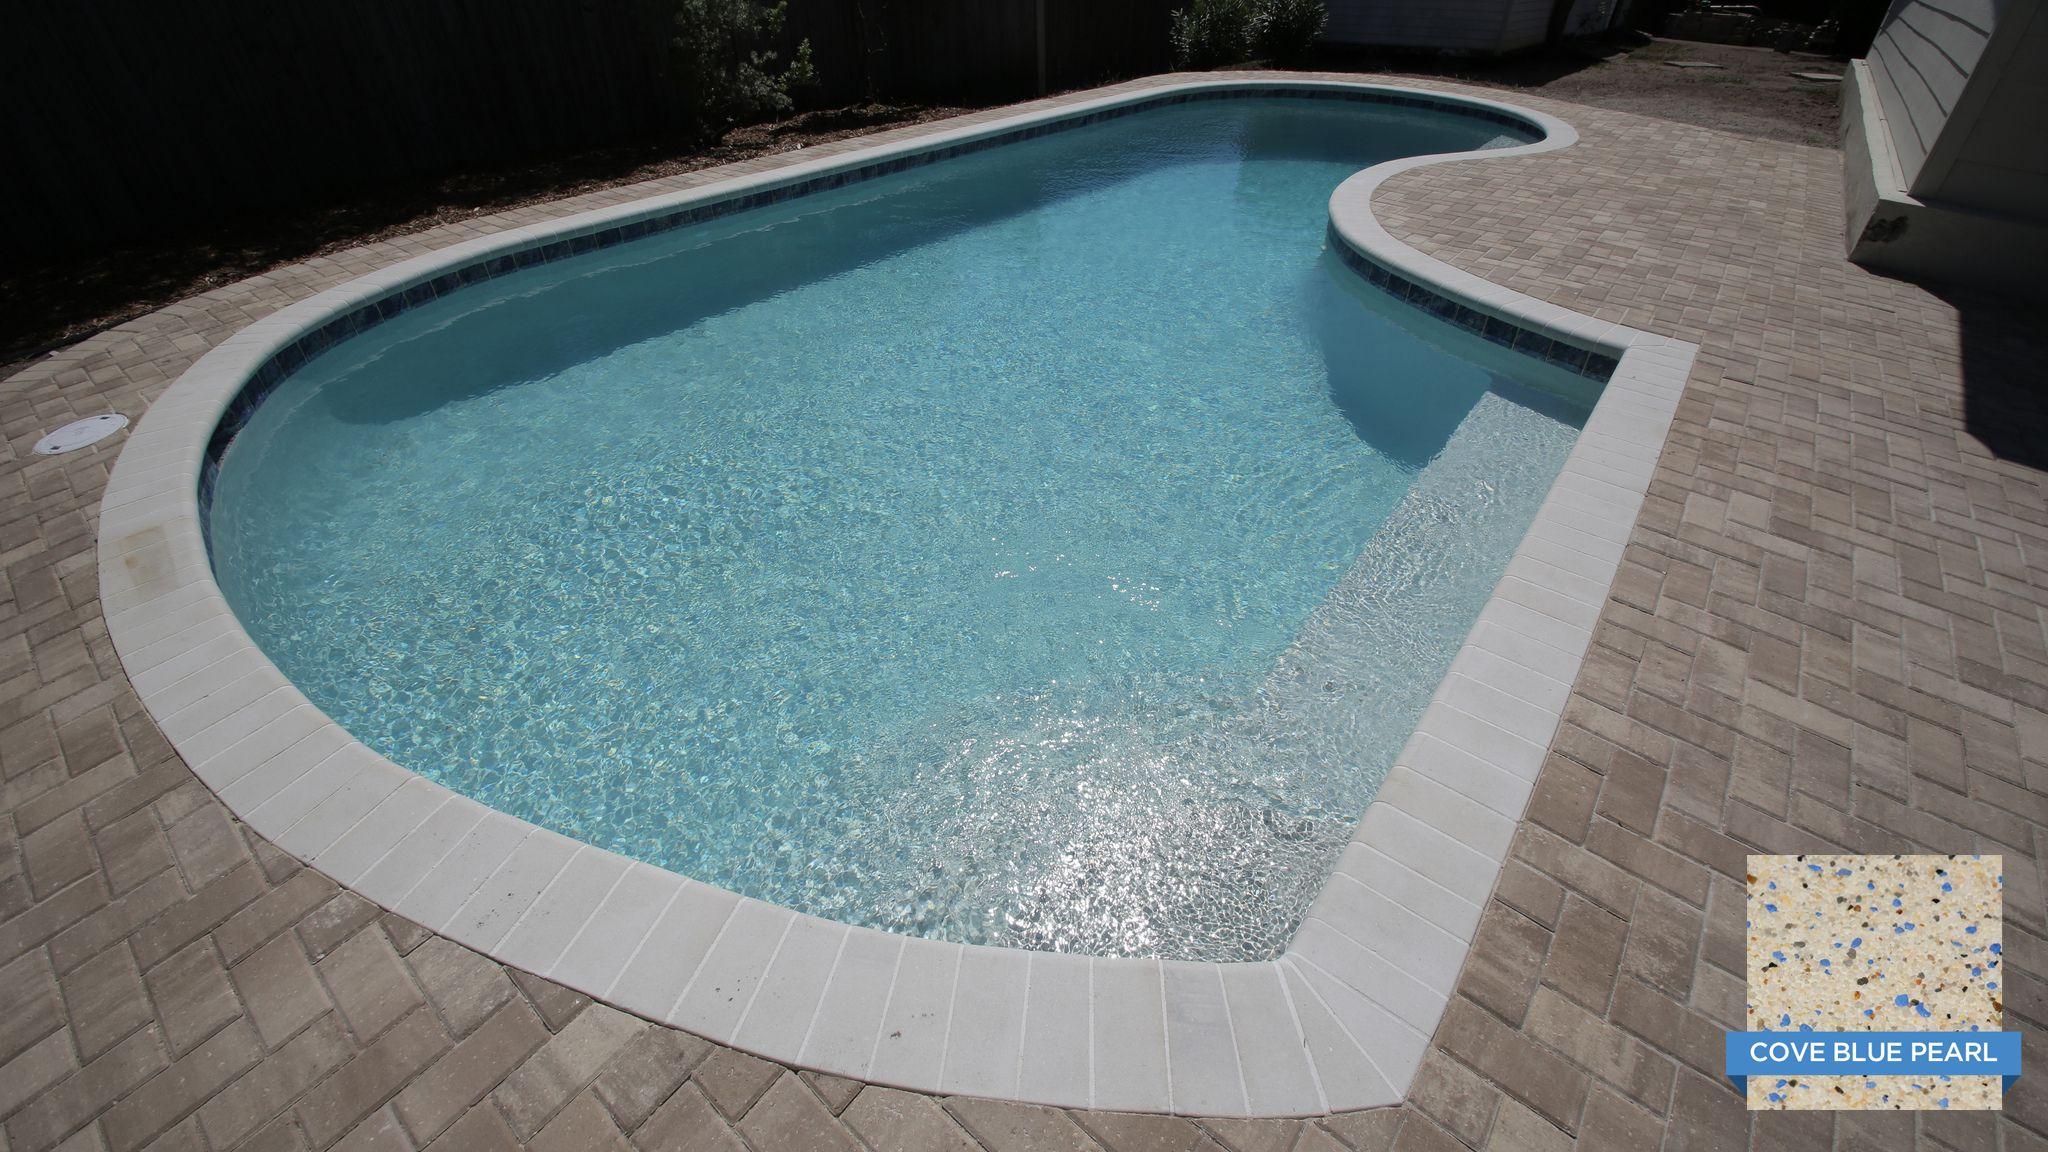 Plaster Color Vs Water Color Pools Amp Spas Forum Gardenweb